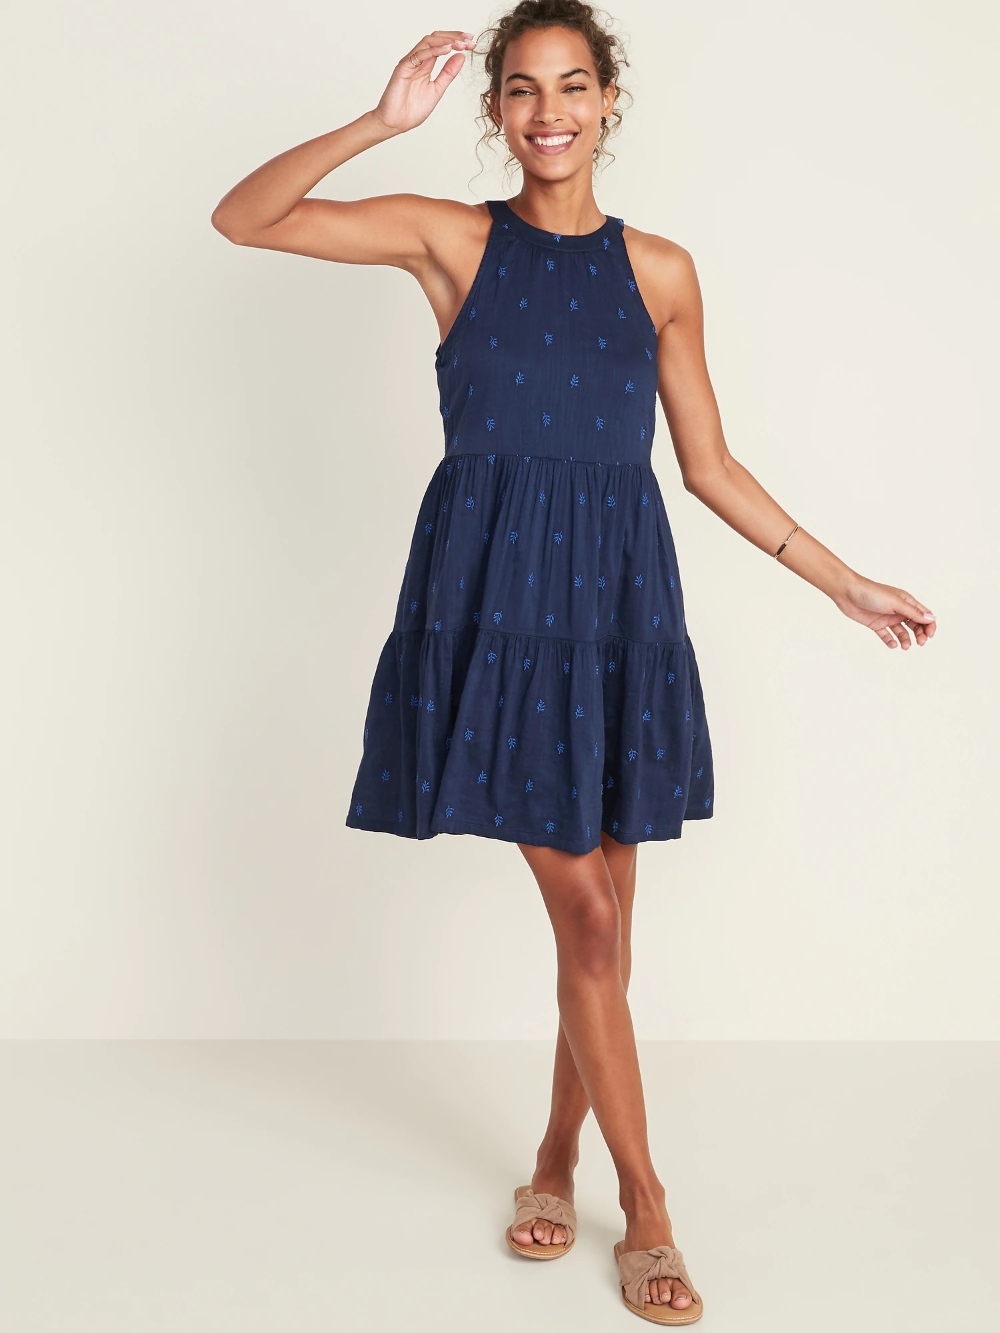 Sleeveless Tiered Swing Dress For Women Old Navy Navy Dress Outfits Swing Dress Tiered Dress Pattern [ 1333 x 1000 Pixel ]